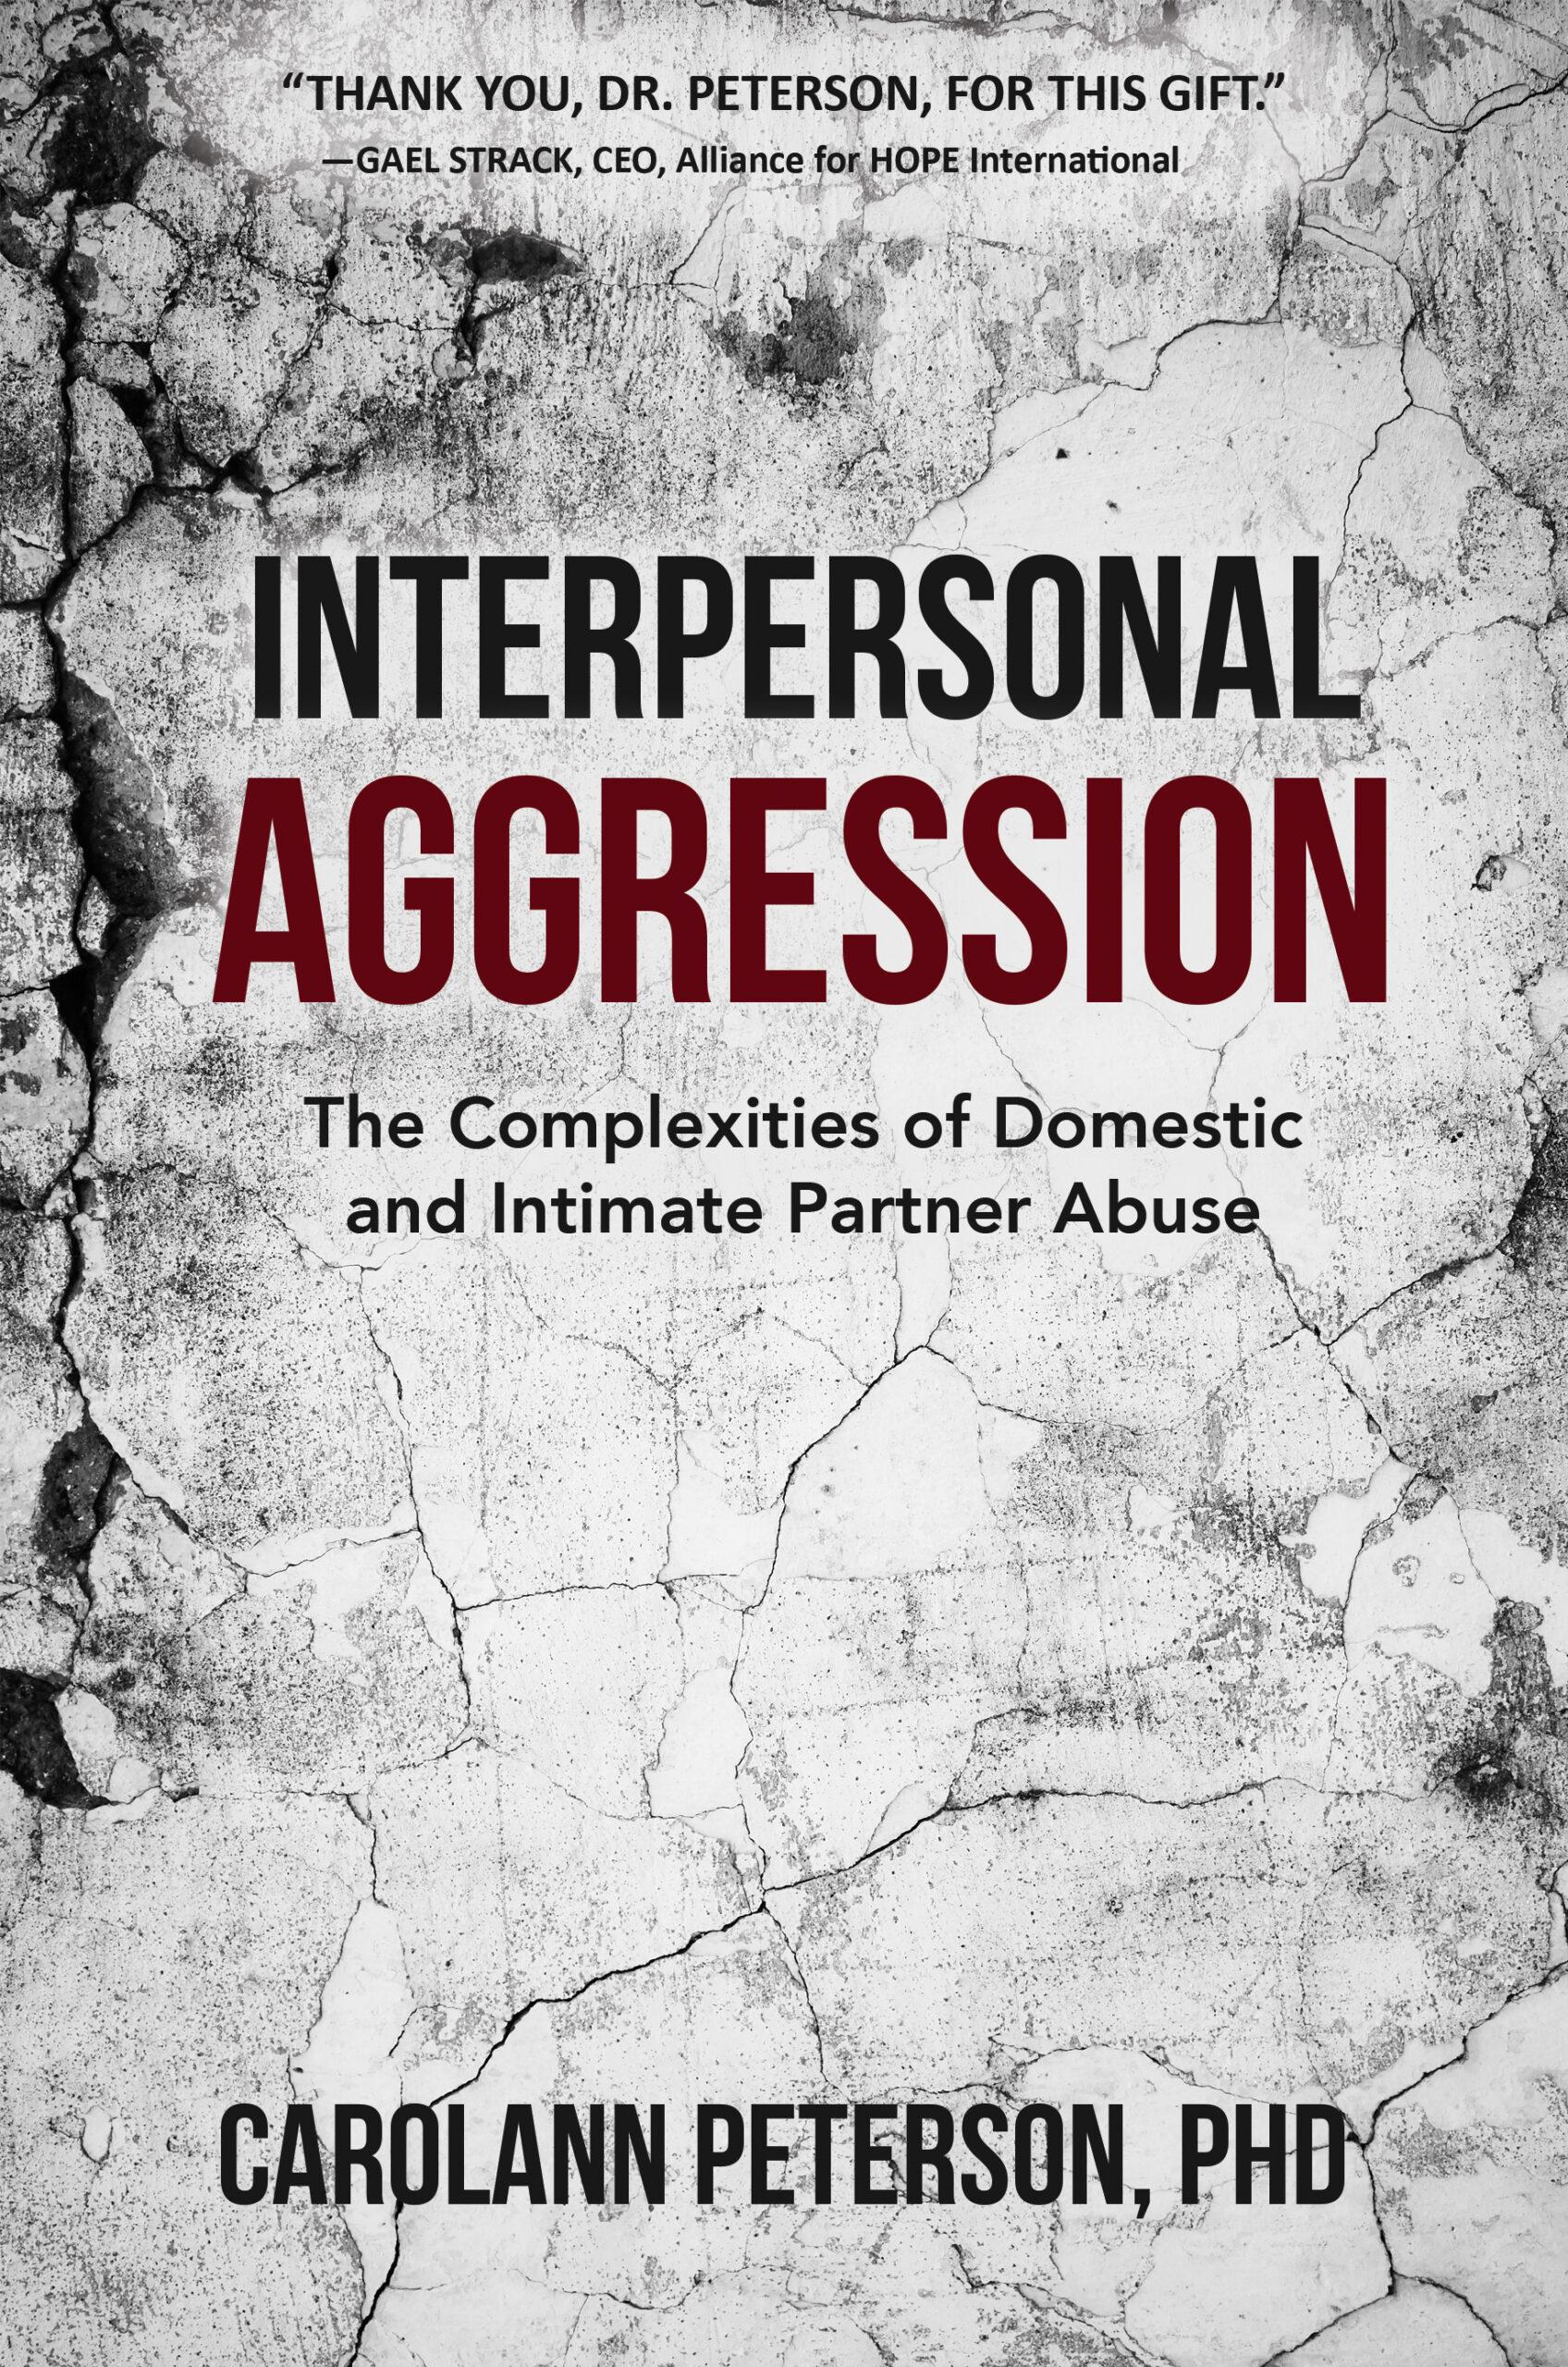 Interpersonal Aggression by CarolAnn Peterson, PhD